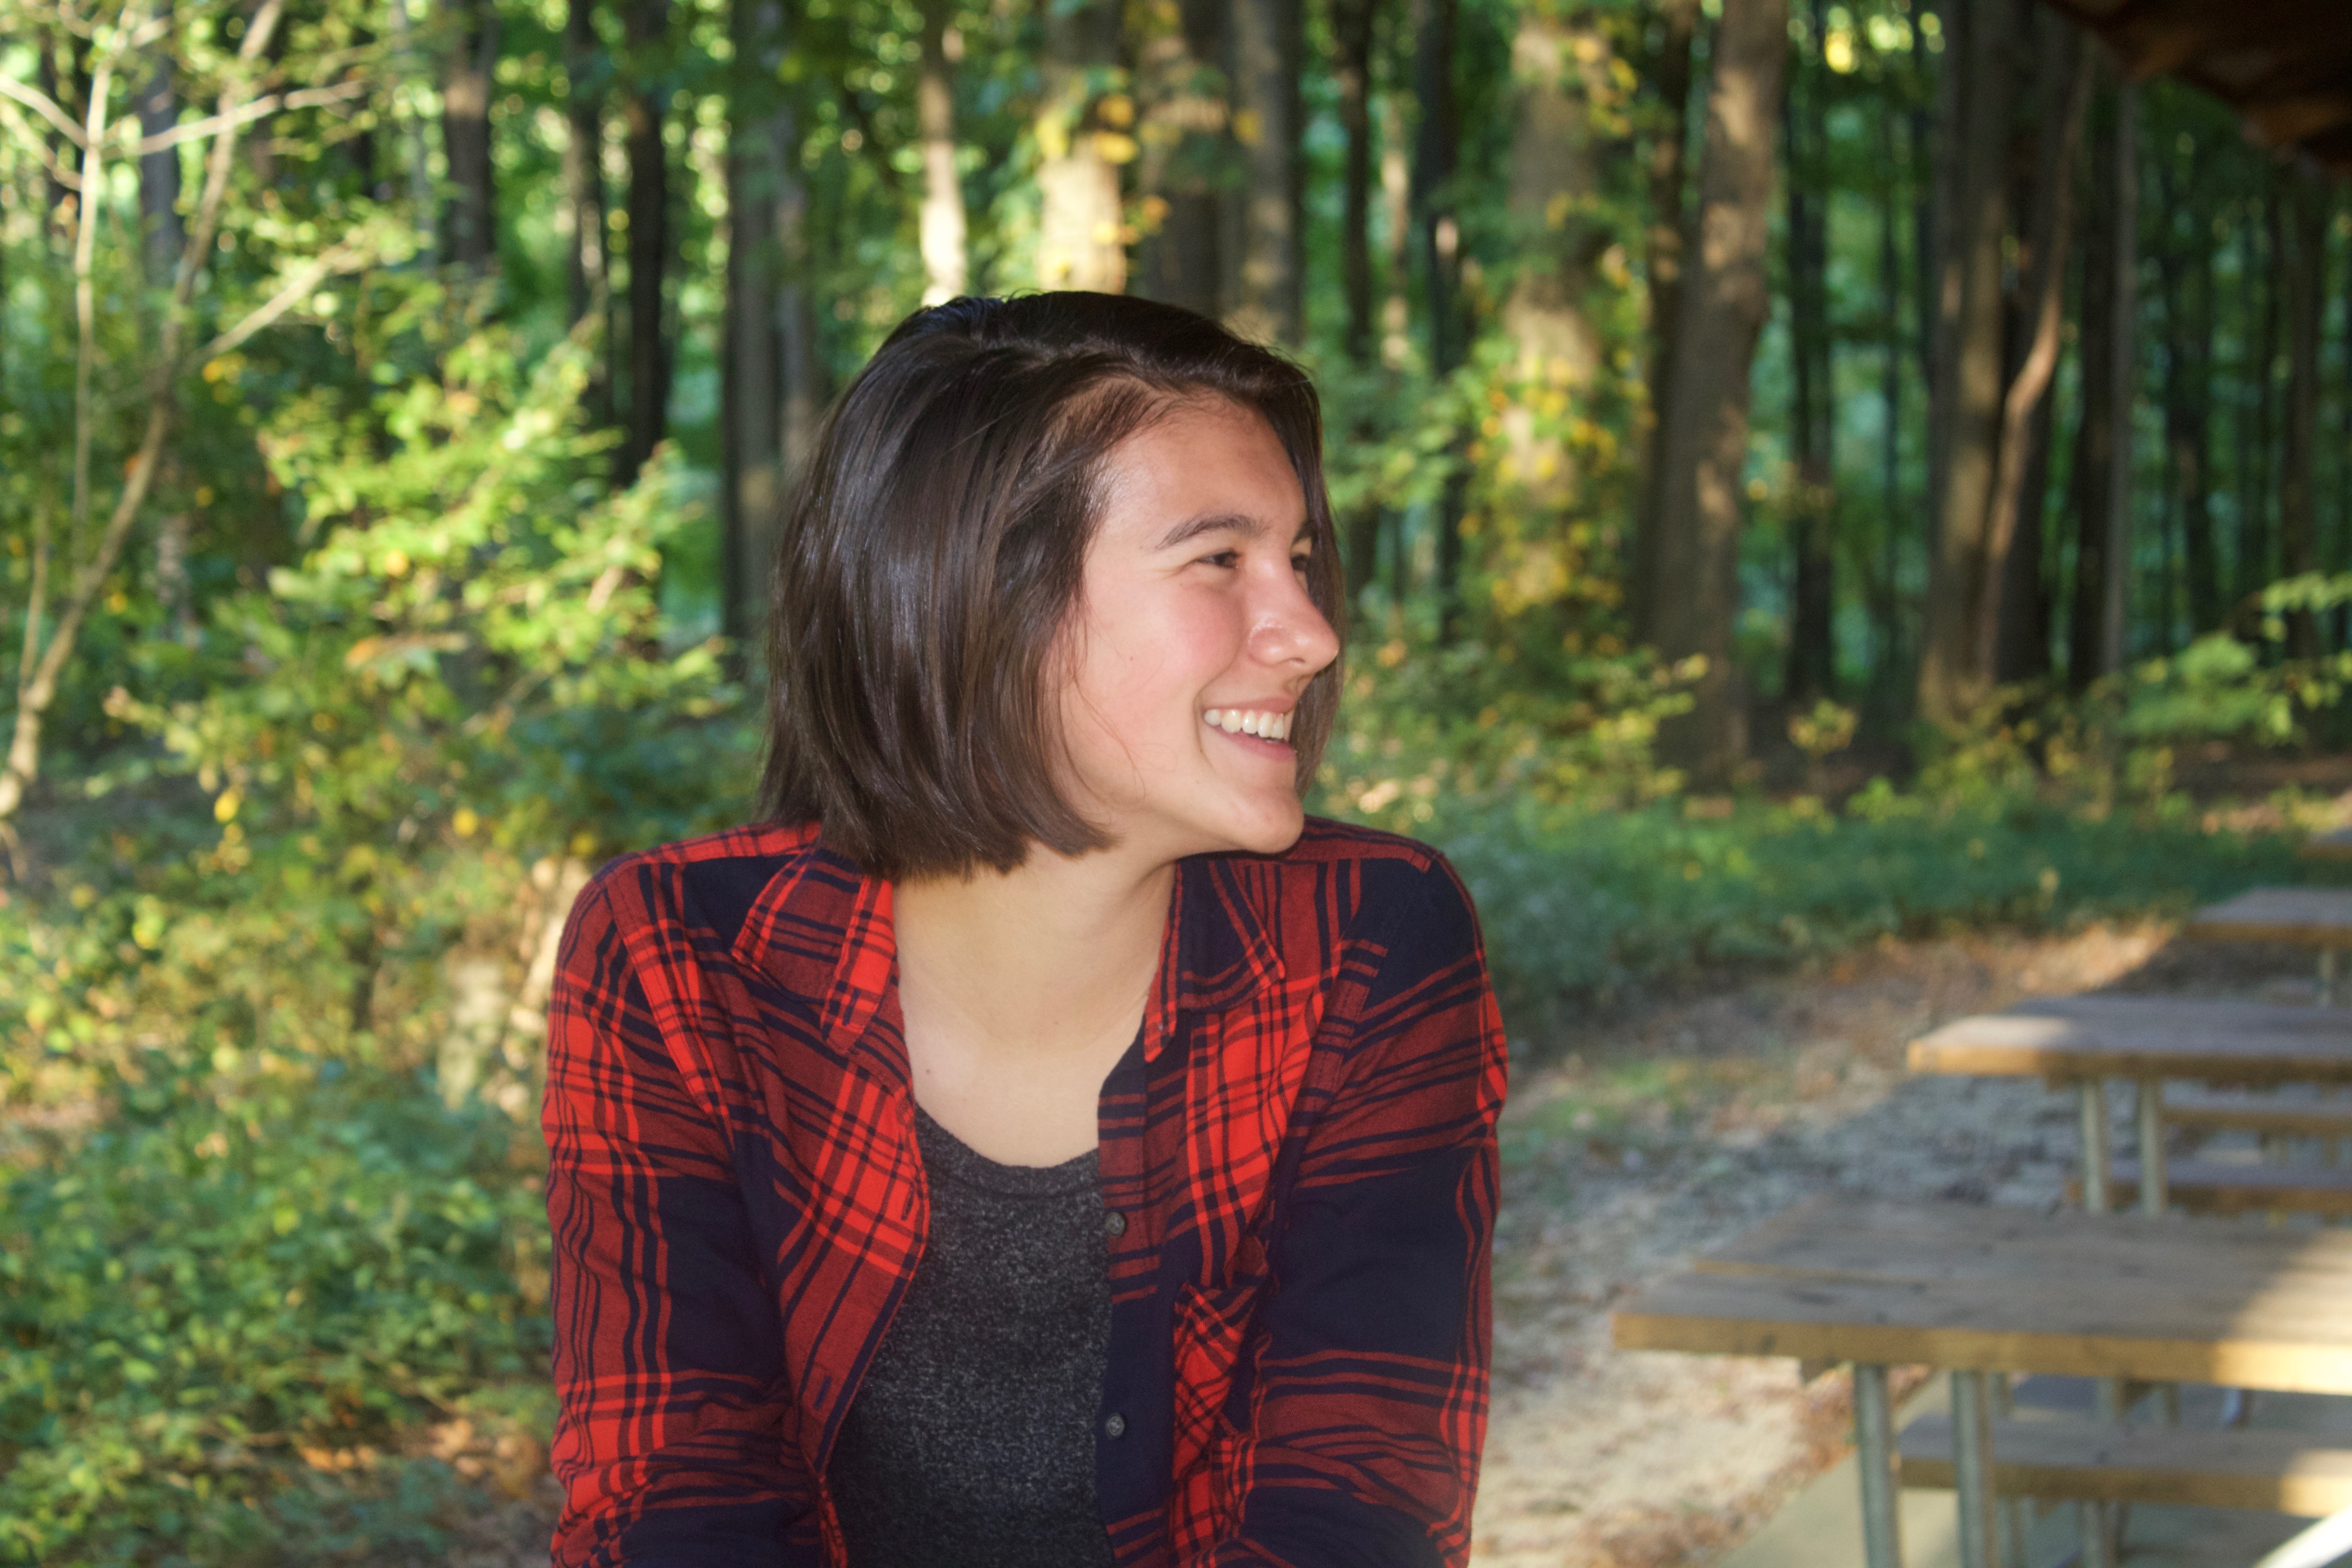 Photograph of Annika Dudik